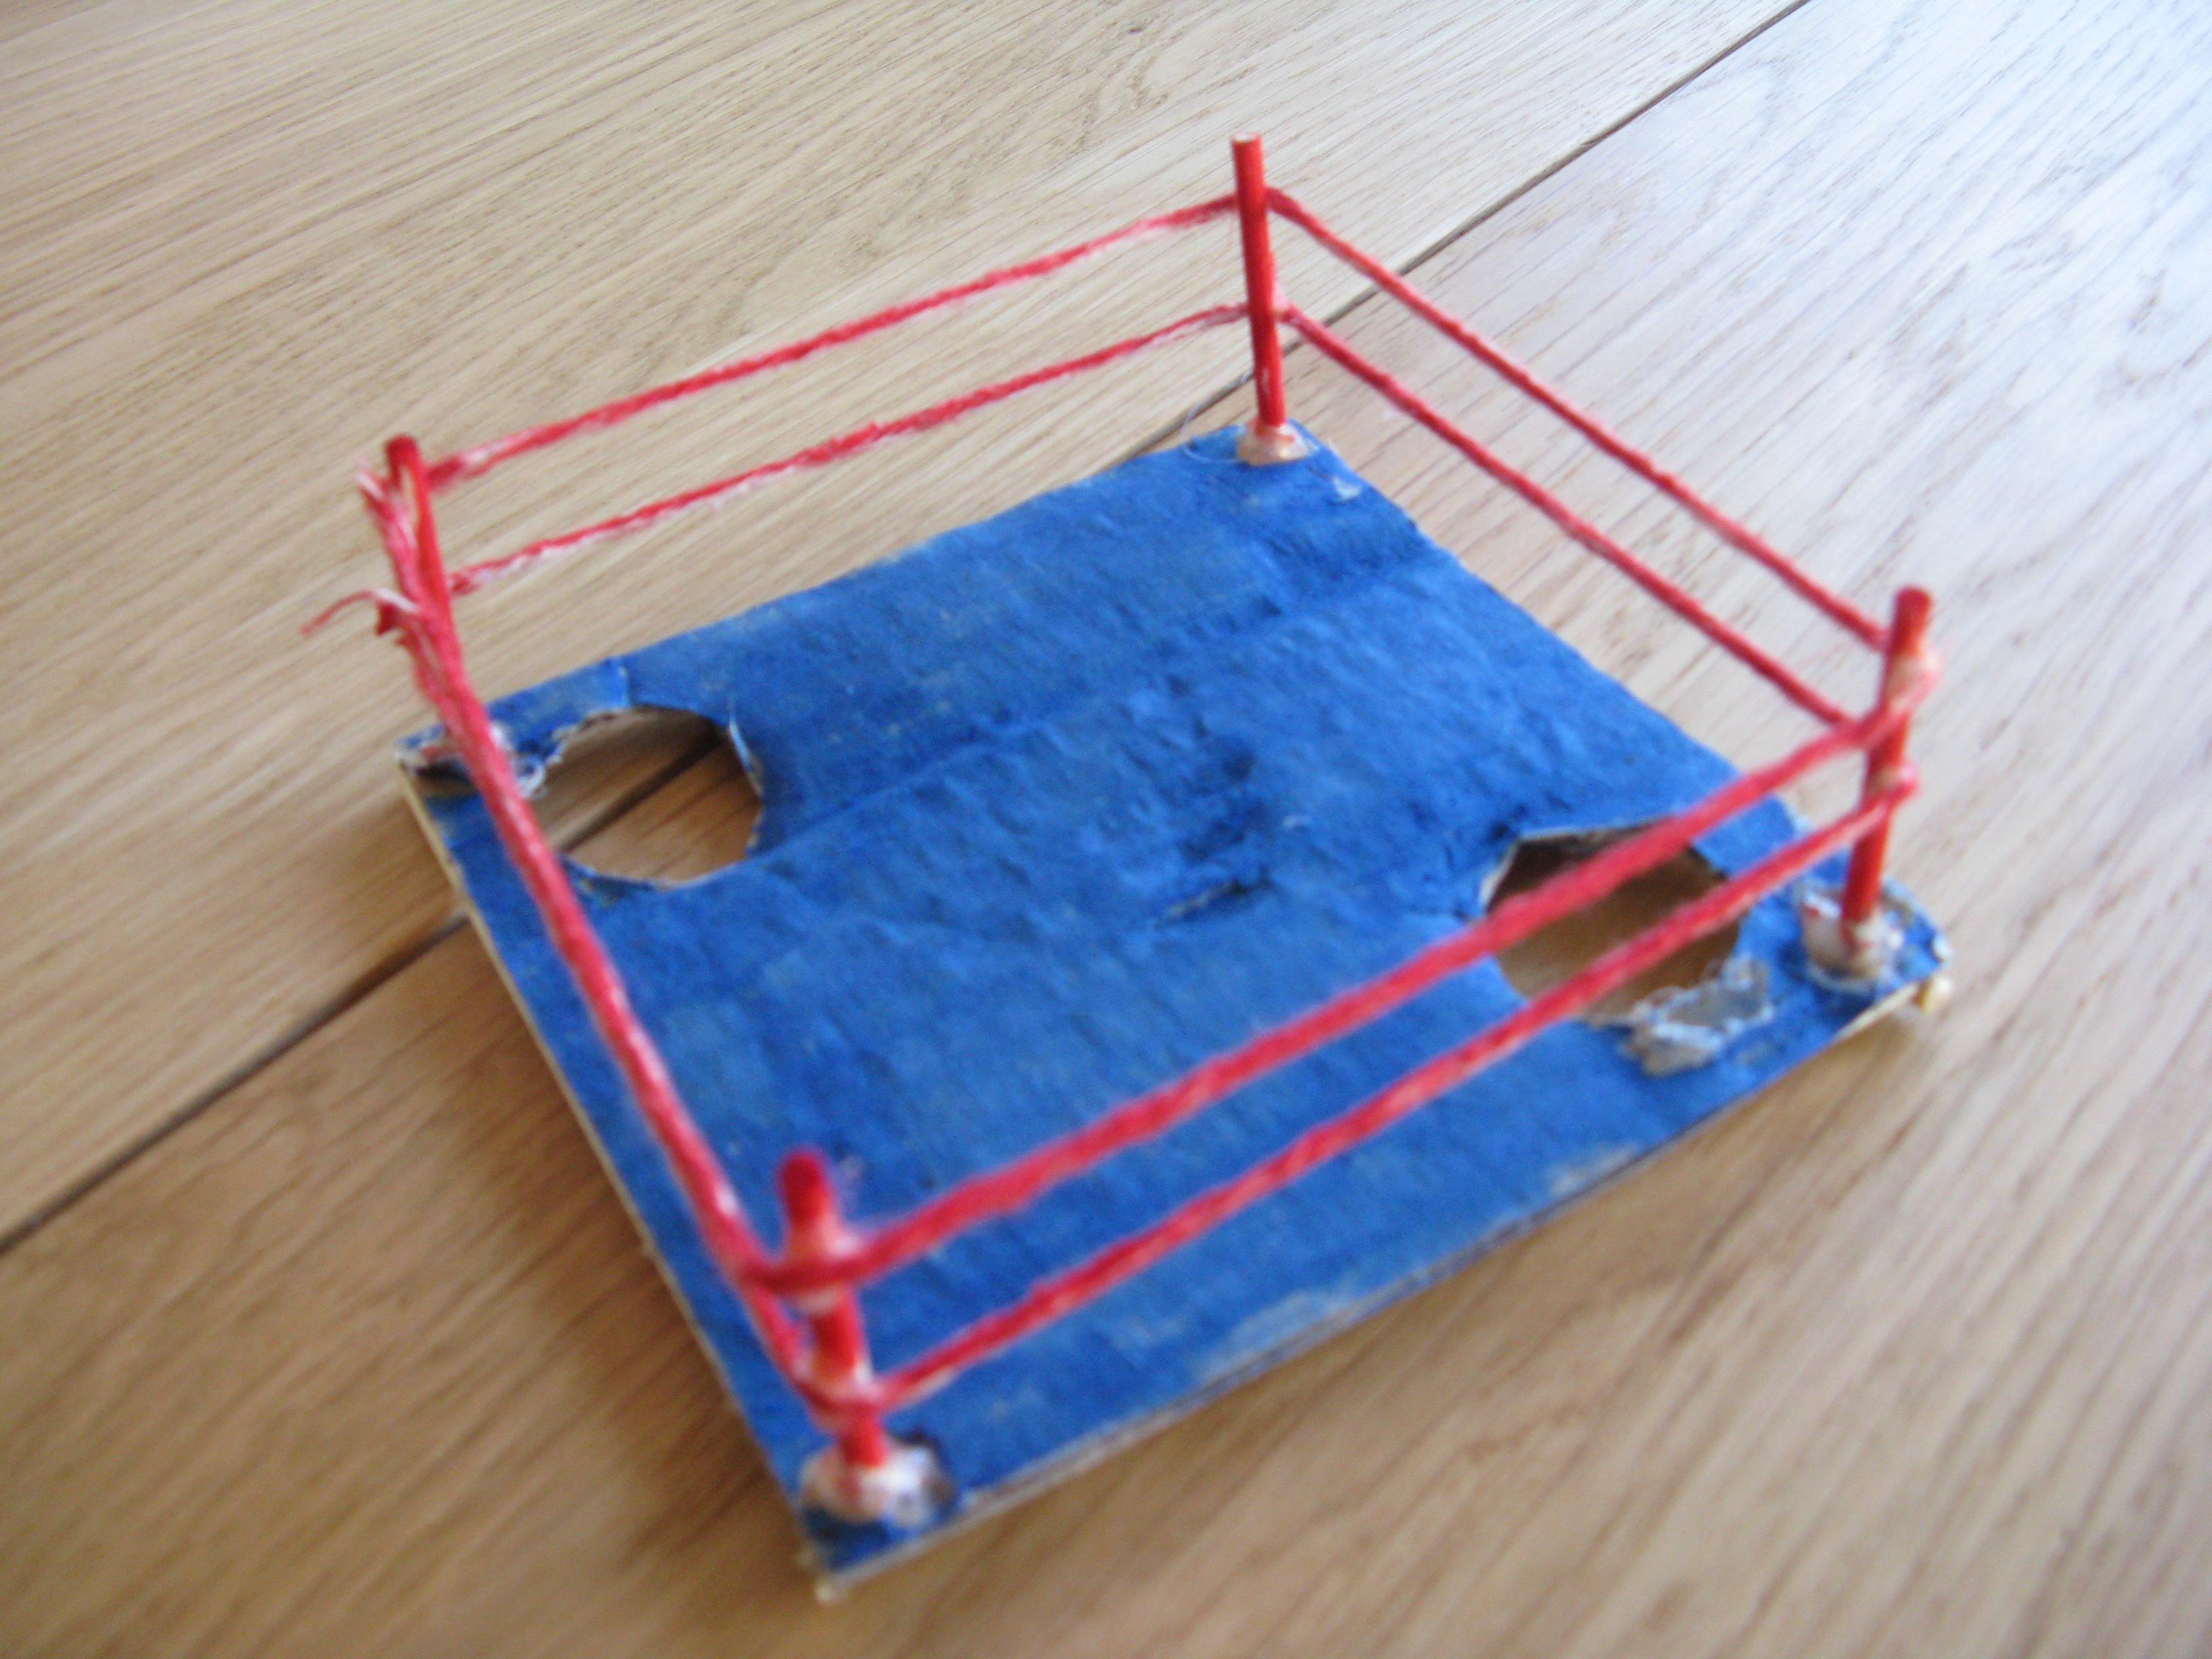 Thumb Wrestling Ring.